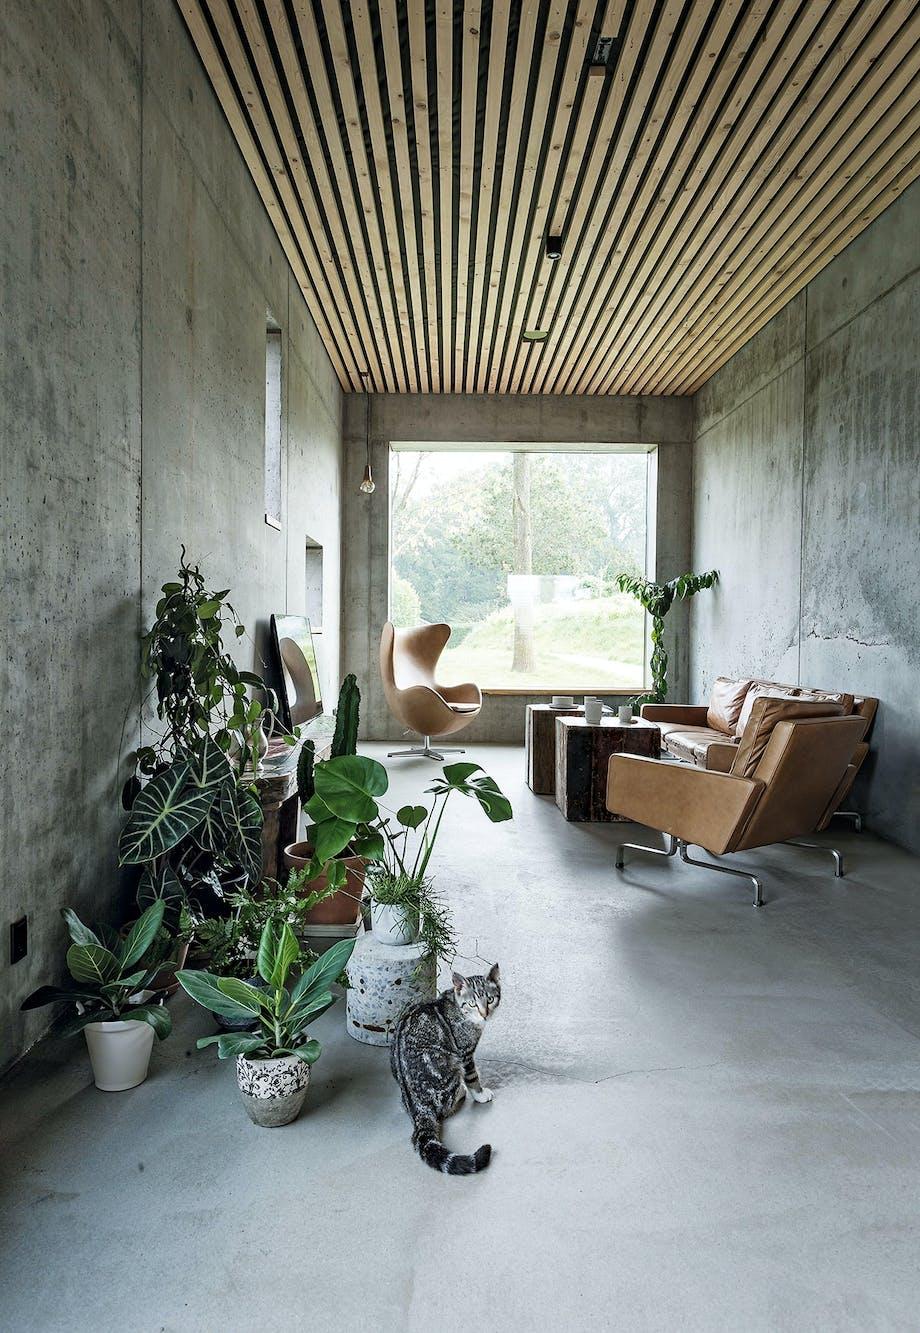 stue beton planter ægget pk31 sofa lænestol